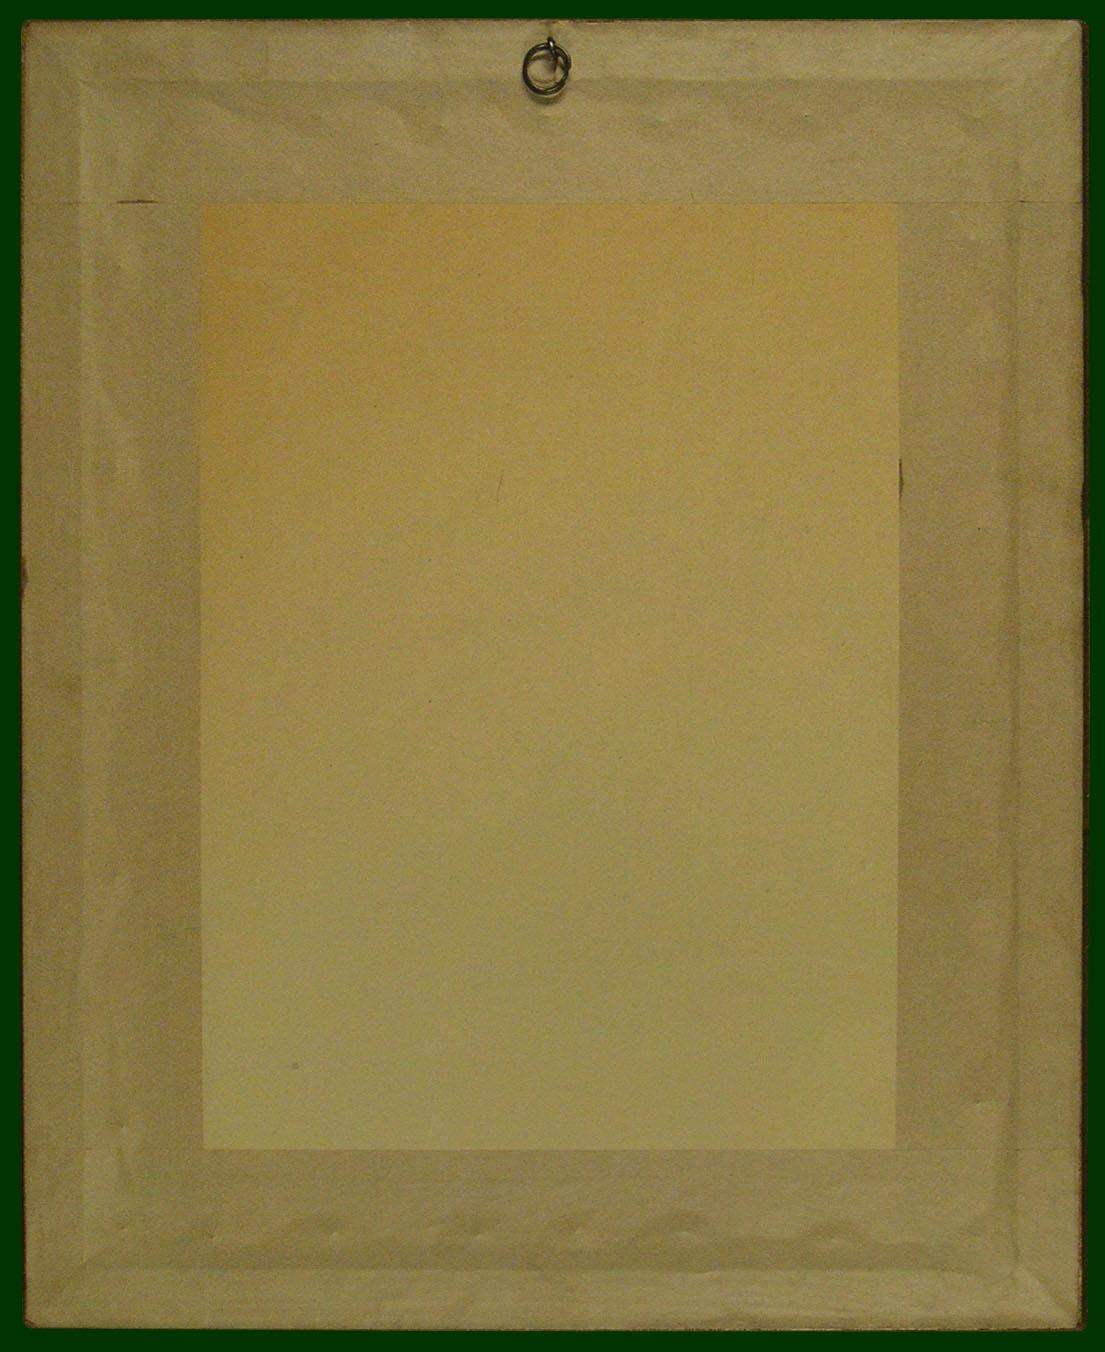 41-3hat.JPG (1105×1352)